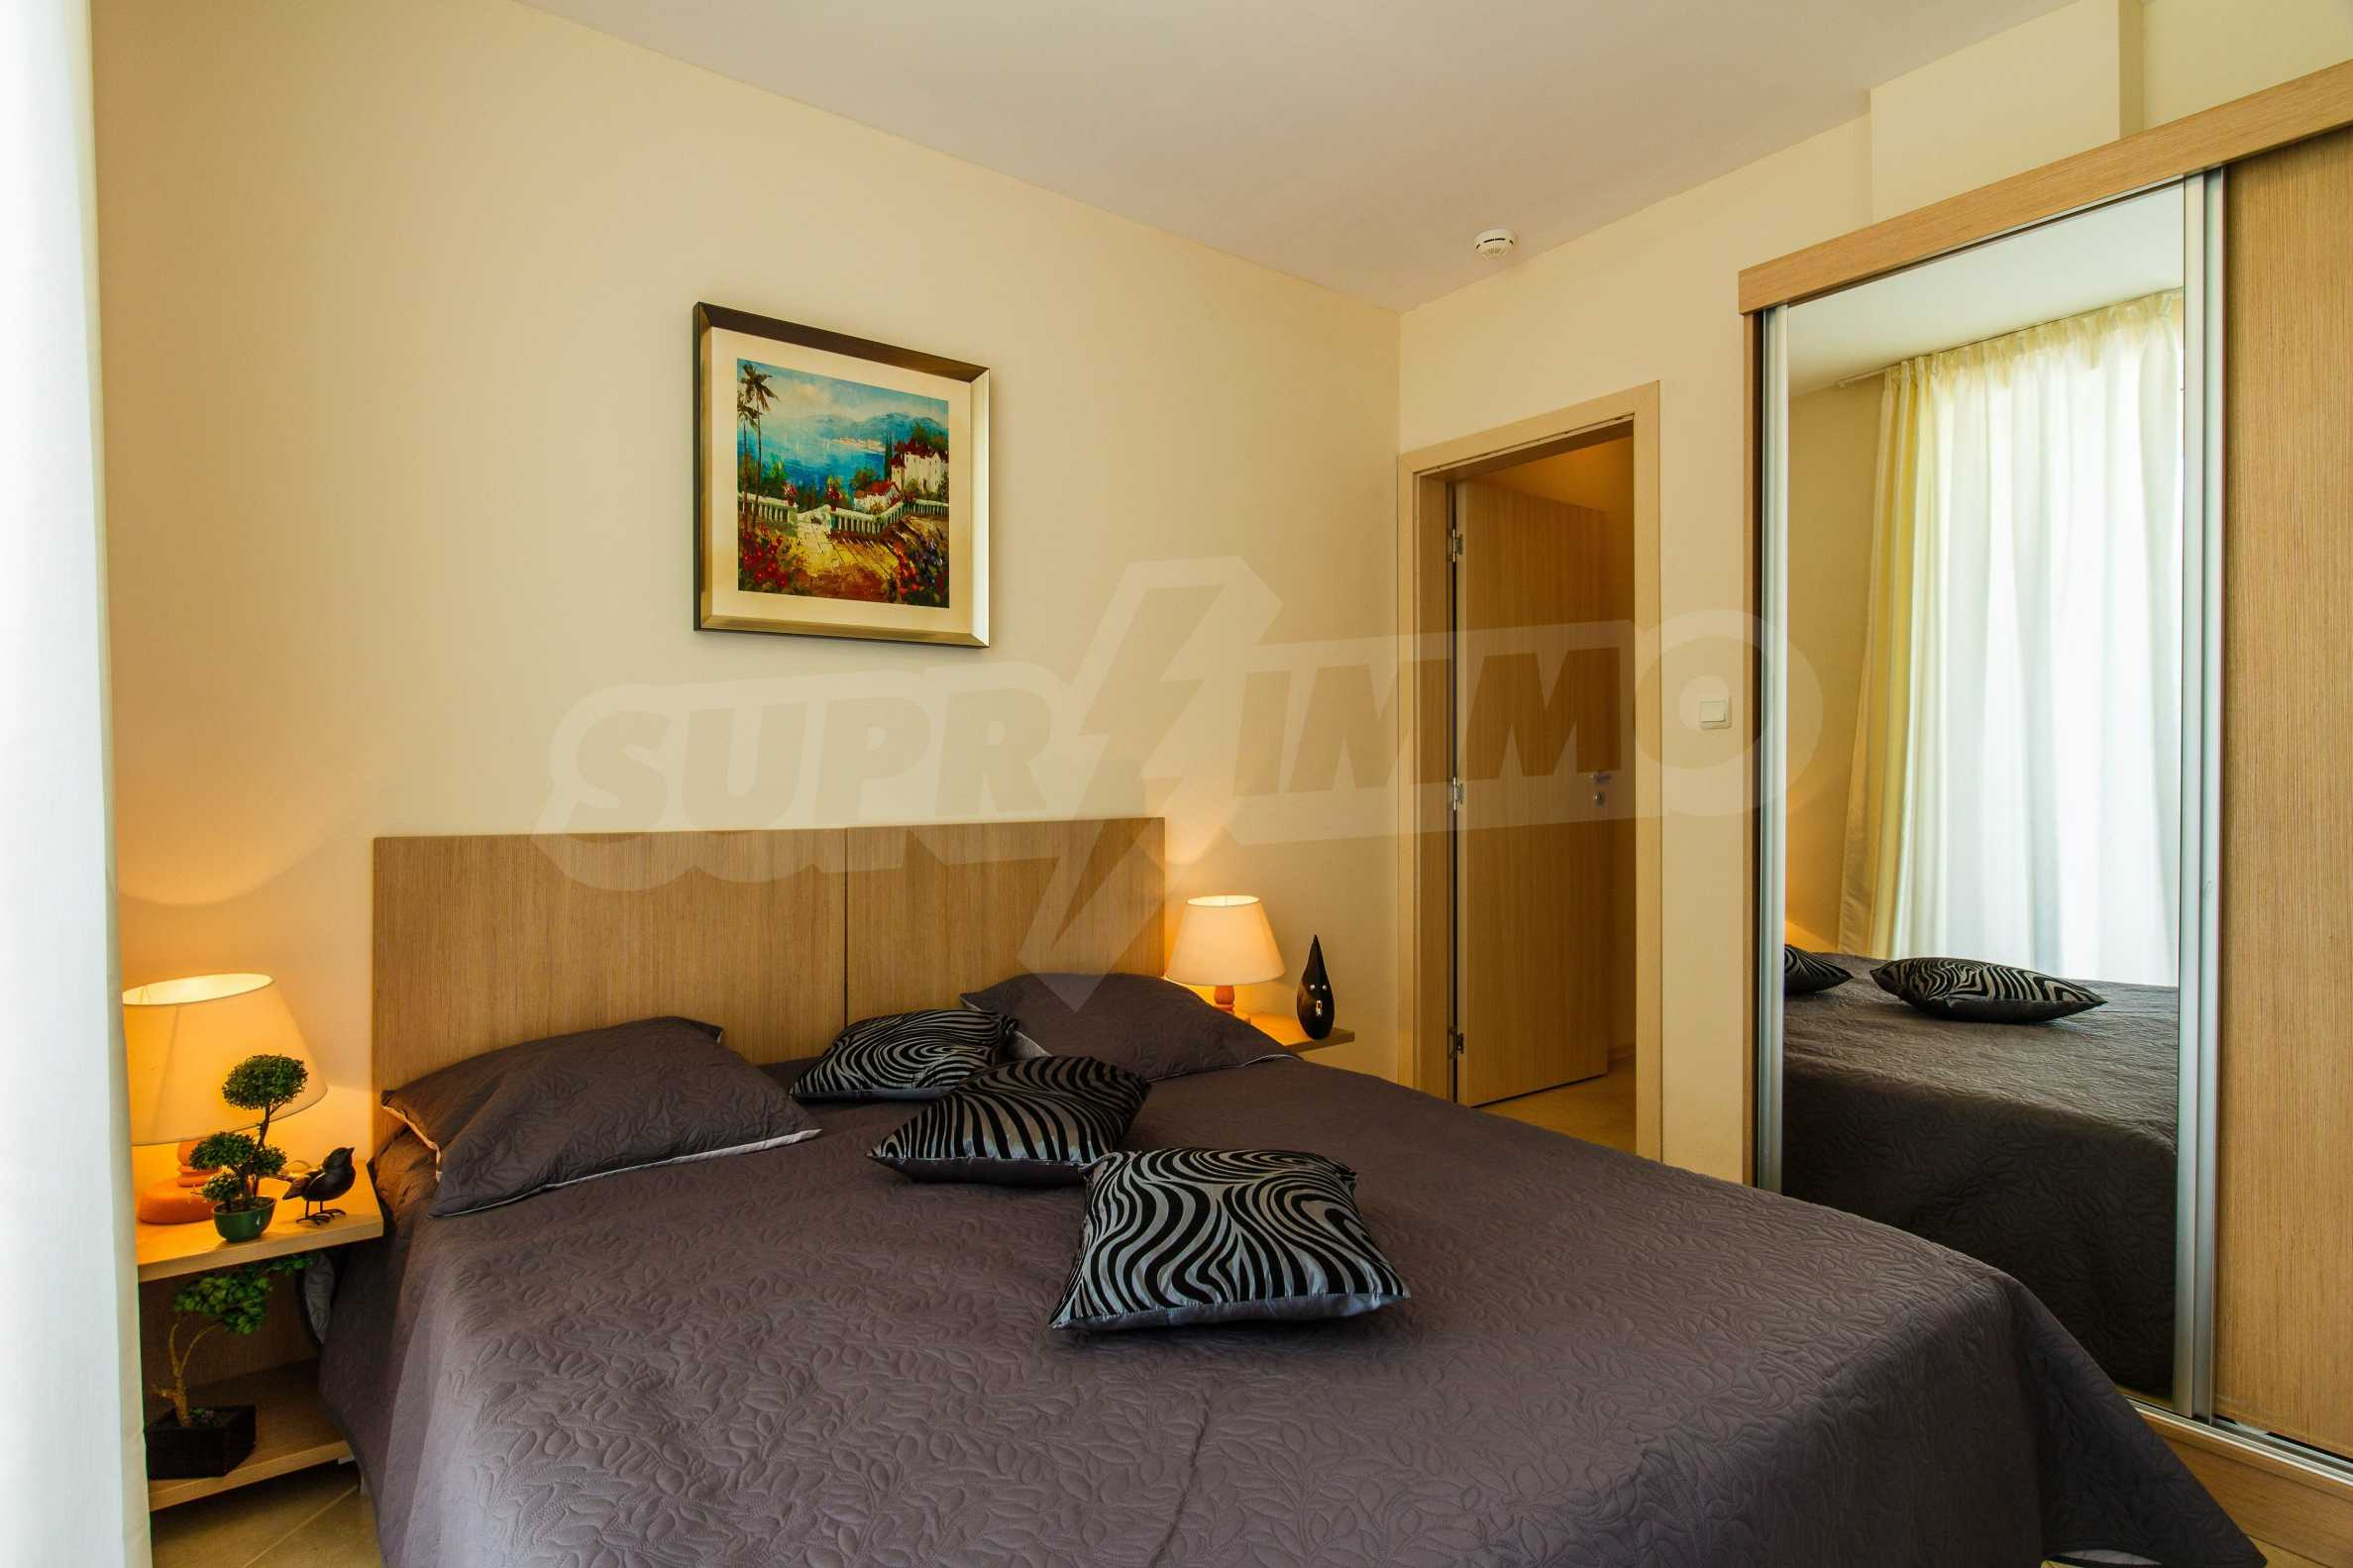 Тристаен апартамент в комплекс Емберли близо до плажа в Лозенец (ап. №423) 3